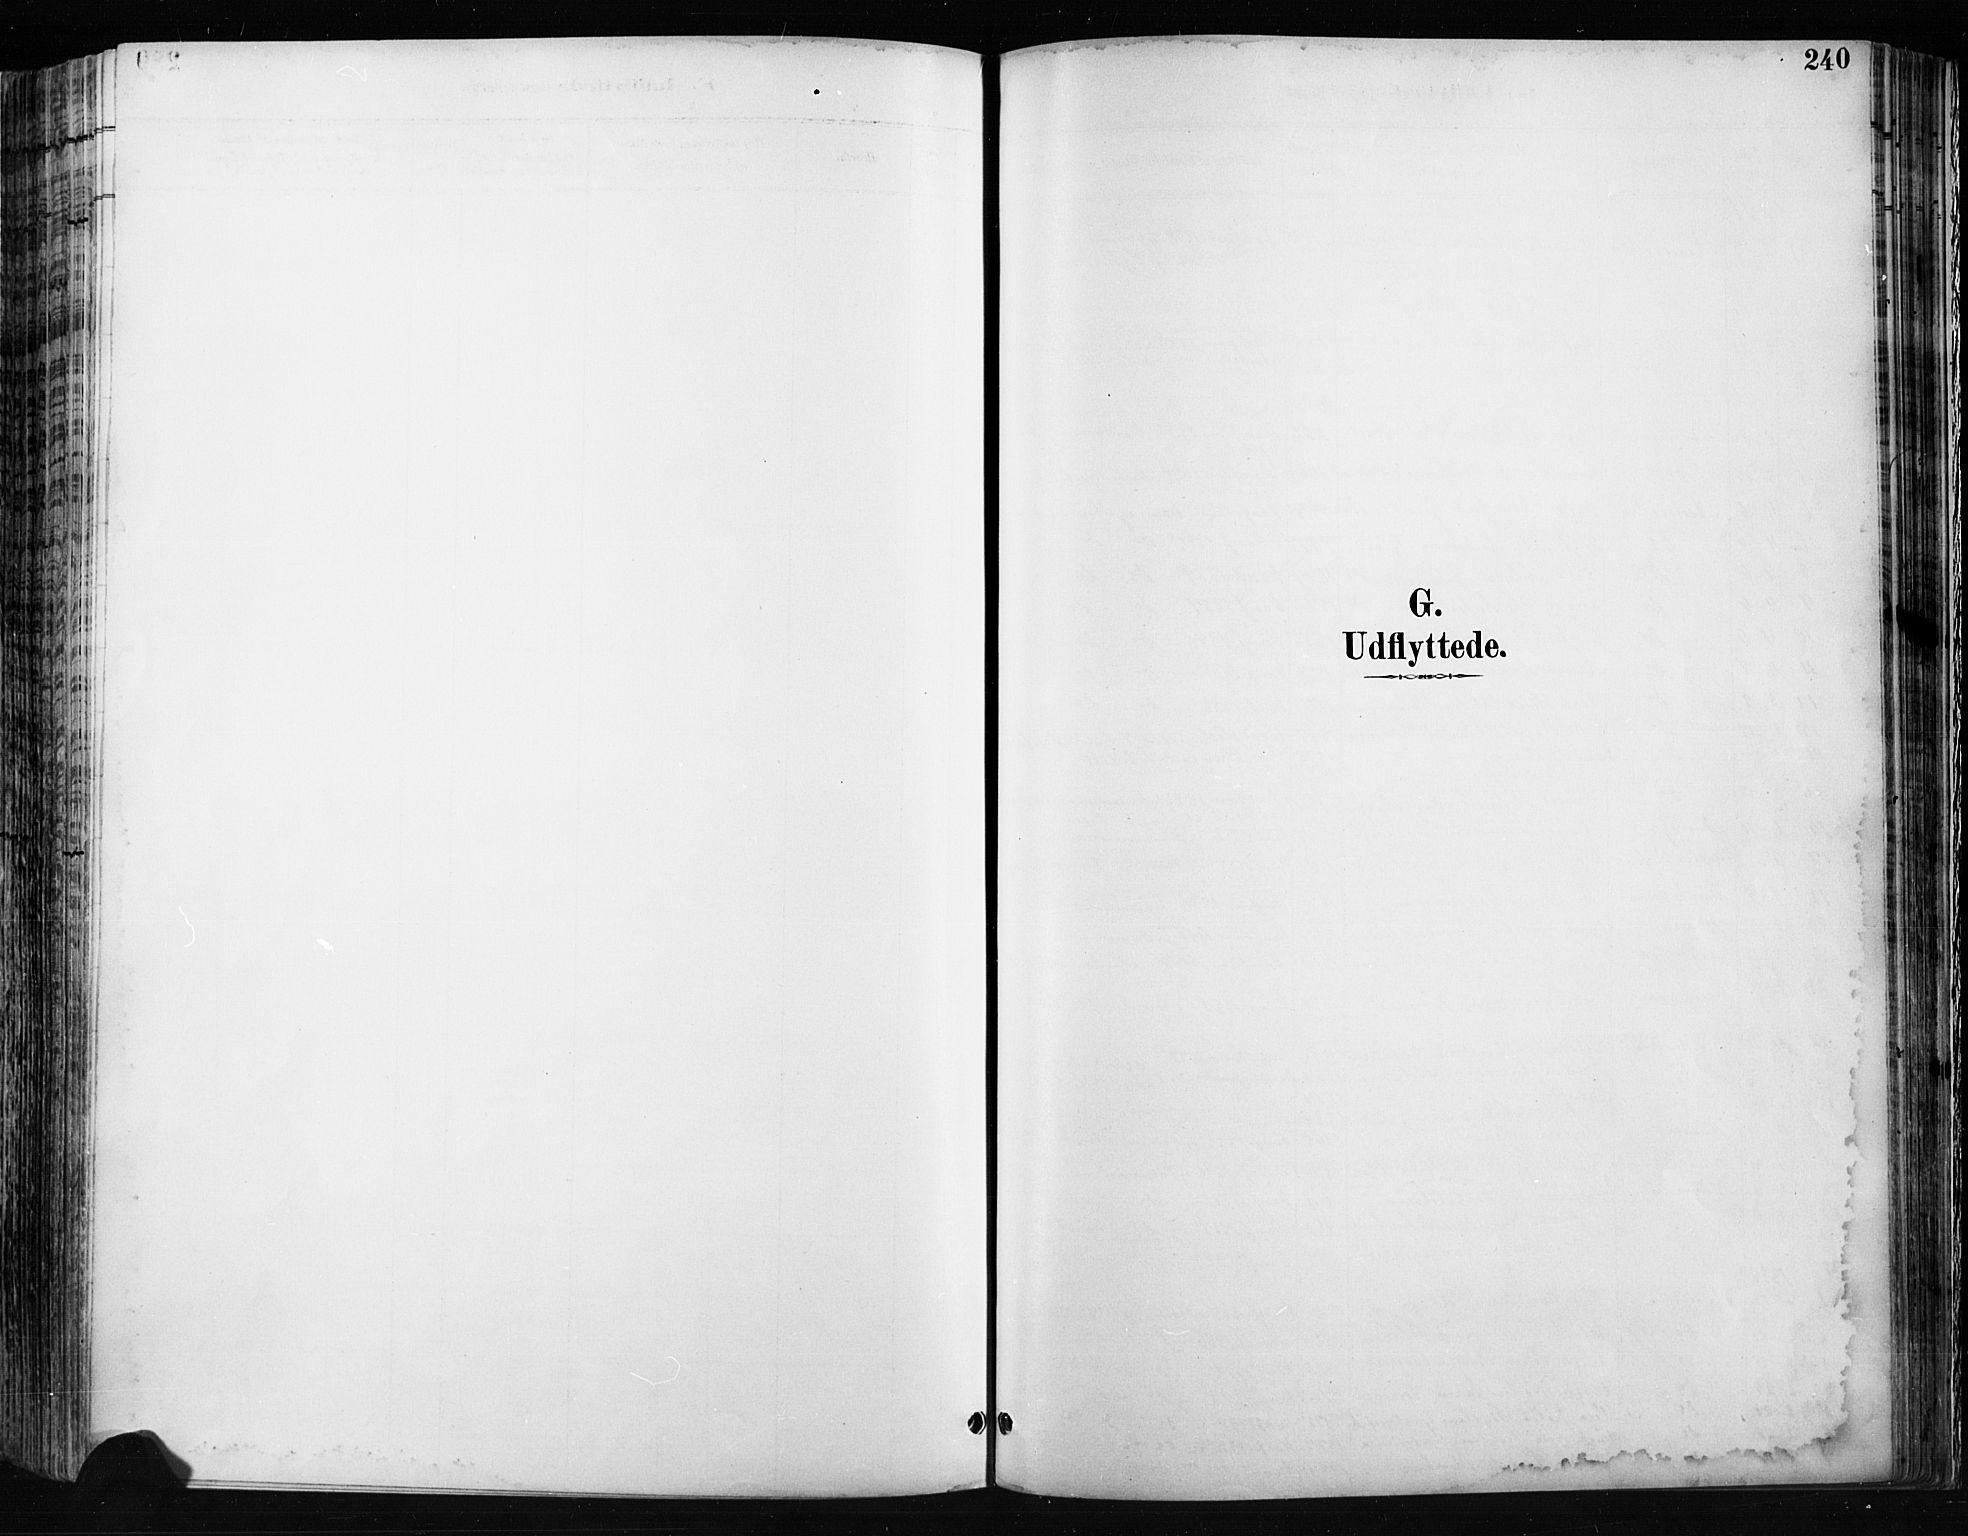 SAH, Jevnaker prestekontor, Ministerialbok nr. 9, 1891-1901, s. 240